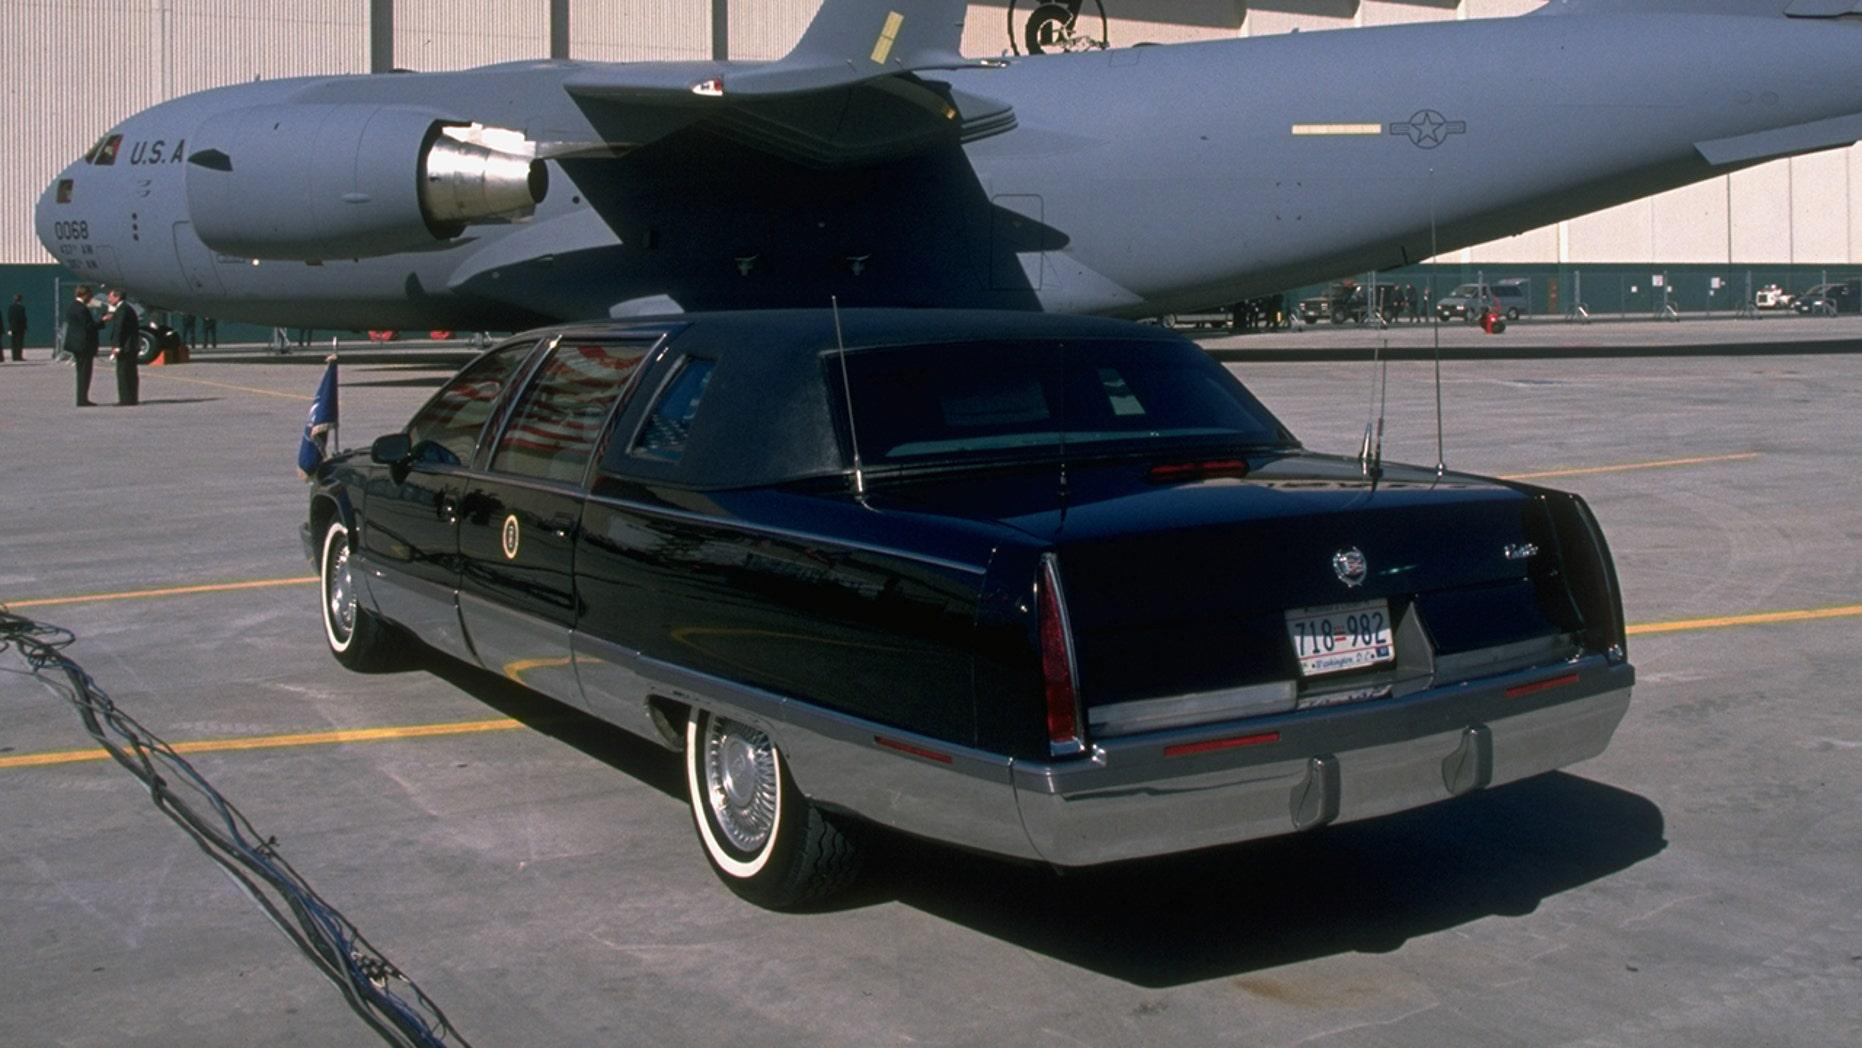 U.S. presidential limousines